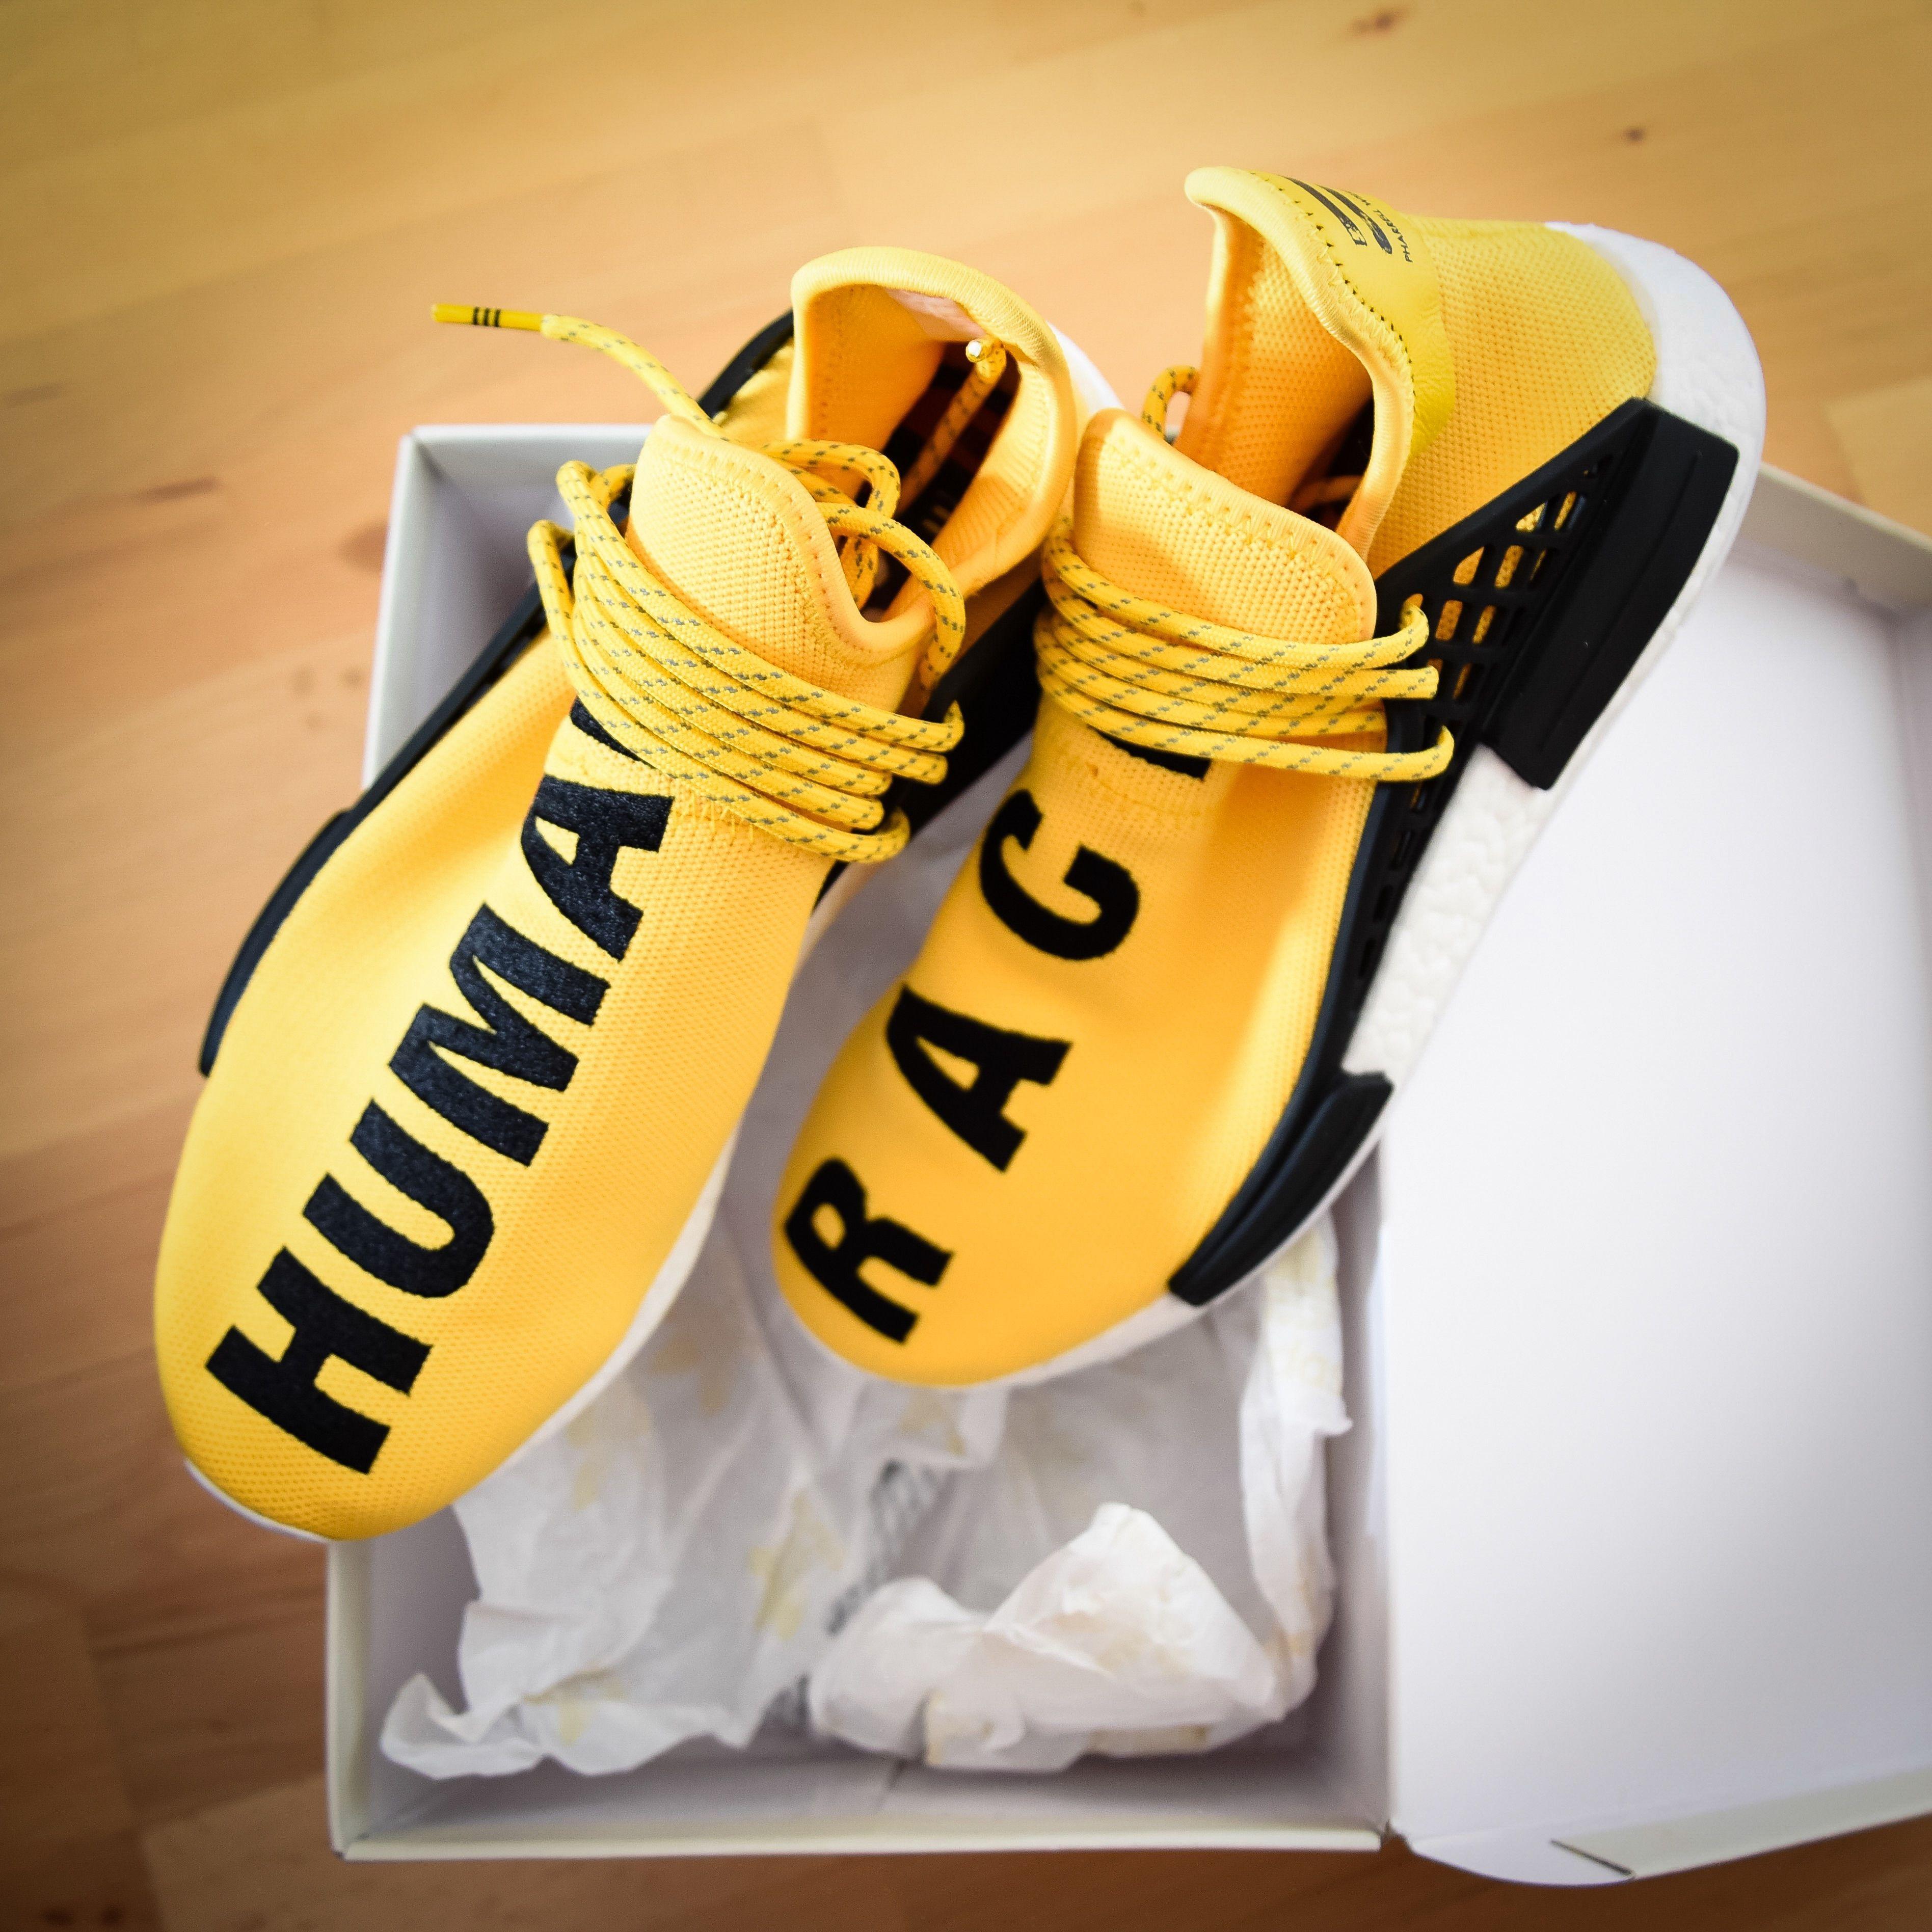 Adidas X Pharrell Nmd Human Race Yellow #Adidas #Pharrell #NMD #HumanRace #